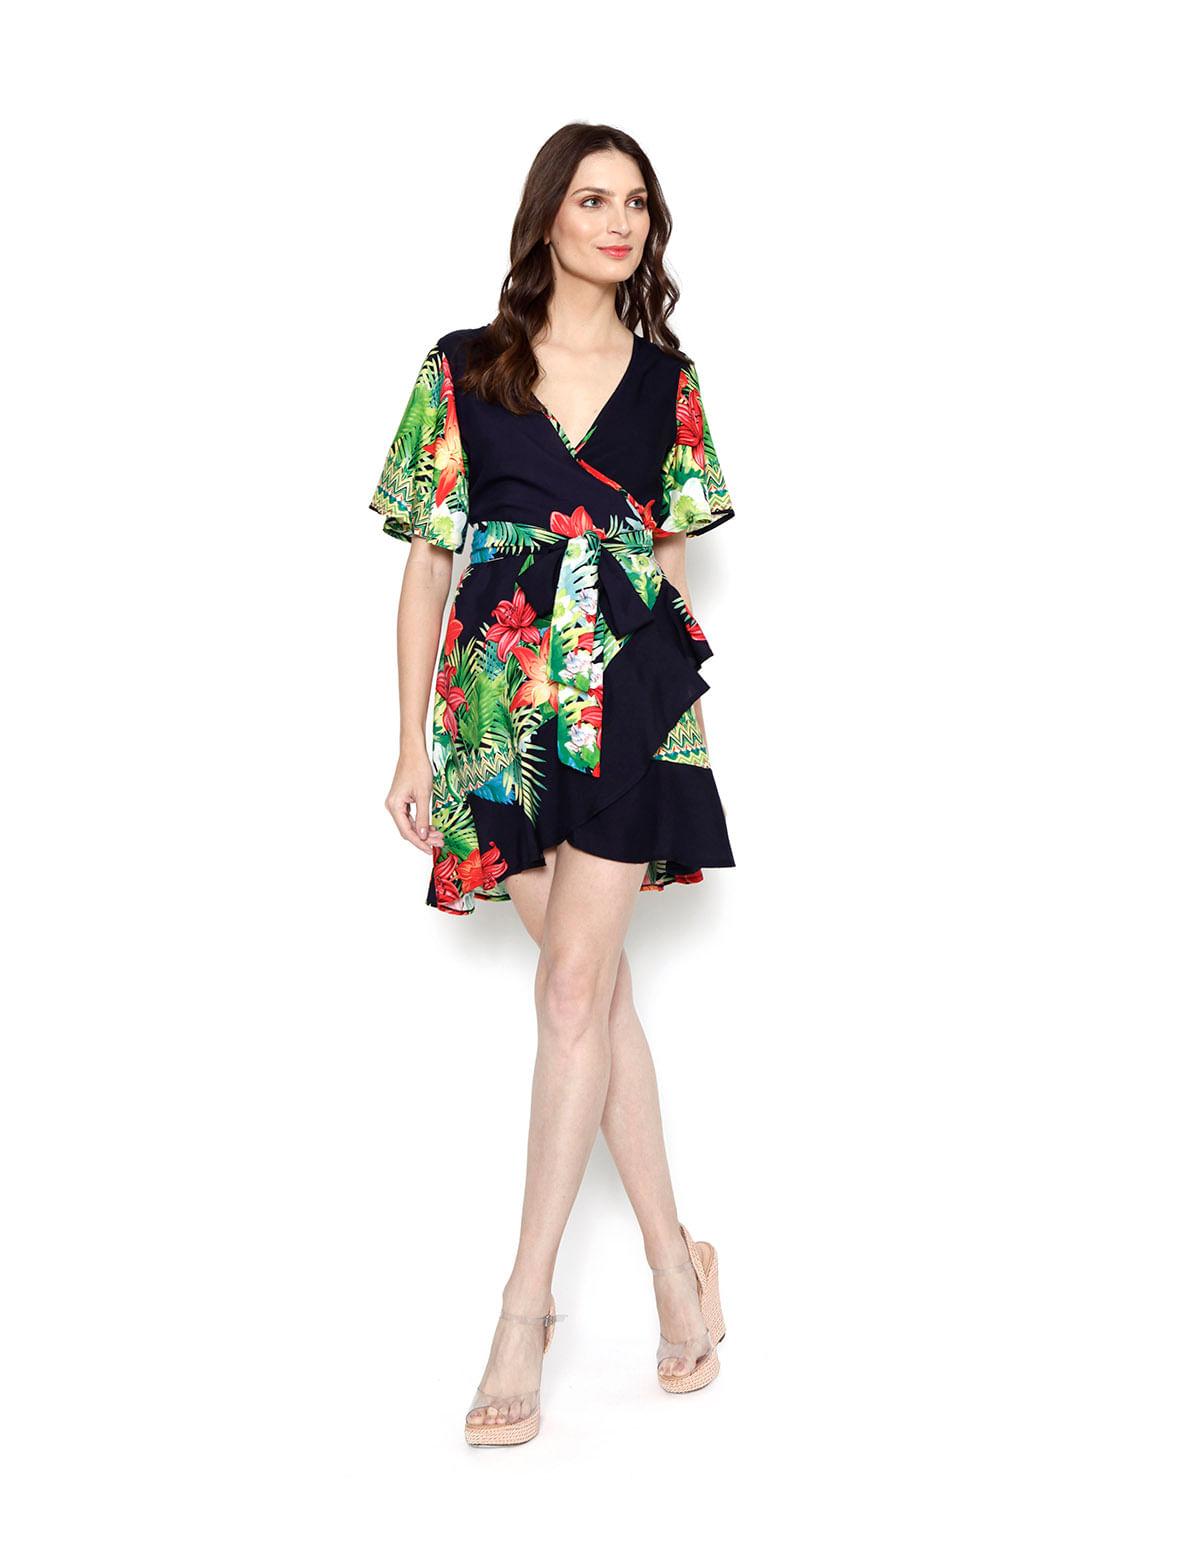 78221100f Vestido curto transpassado marinho floral - LucyintheSky